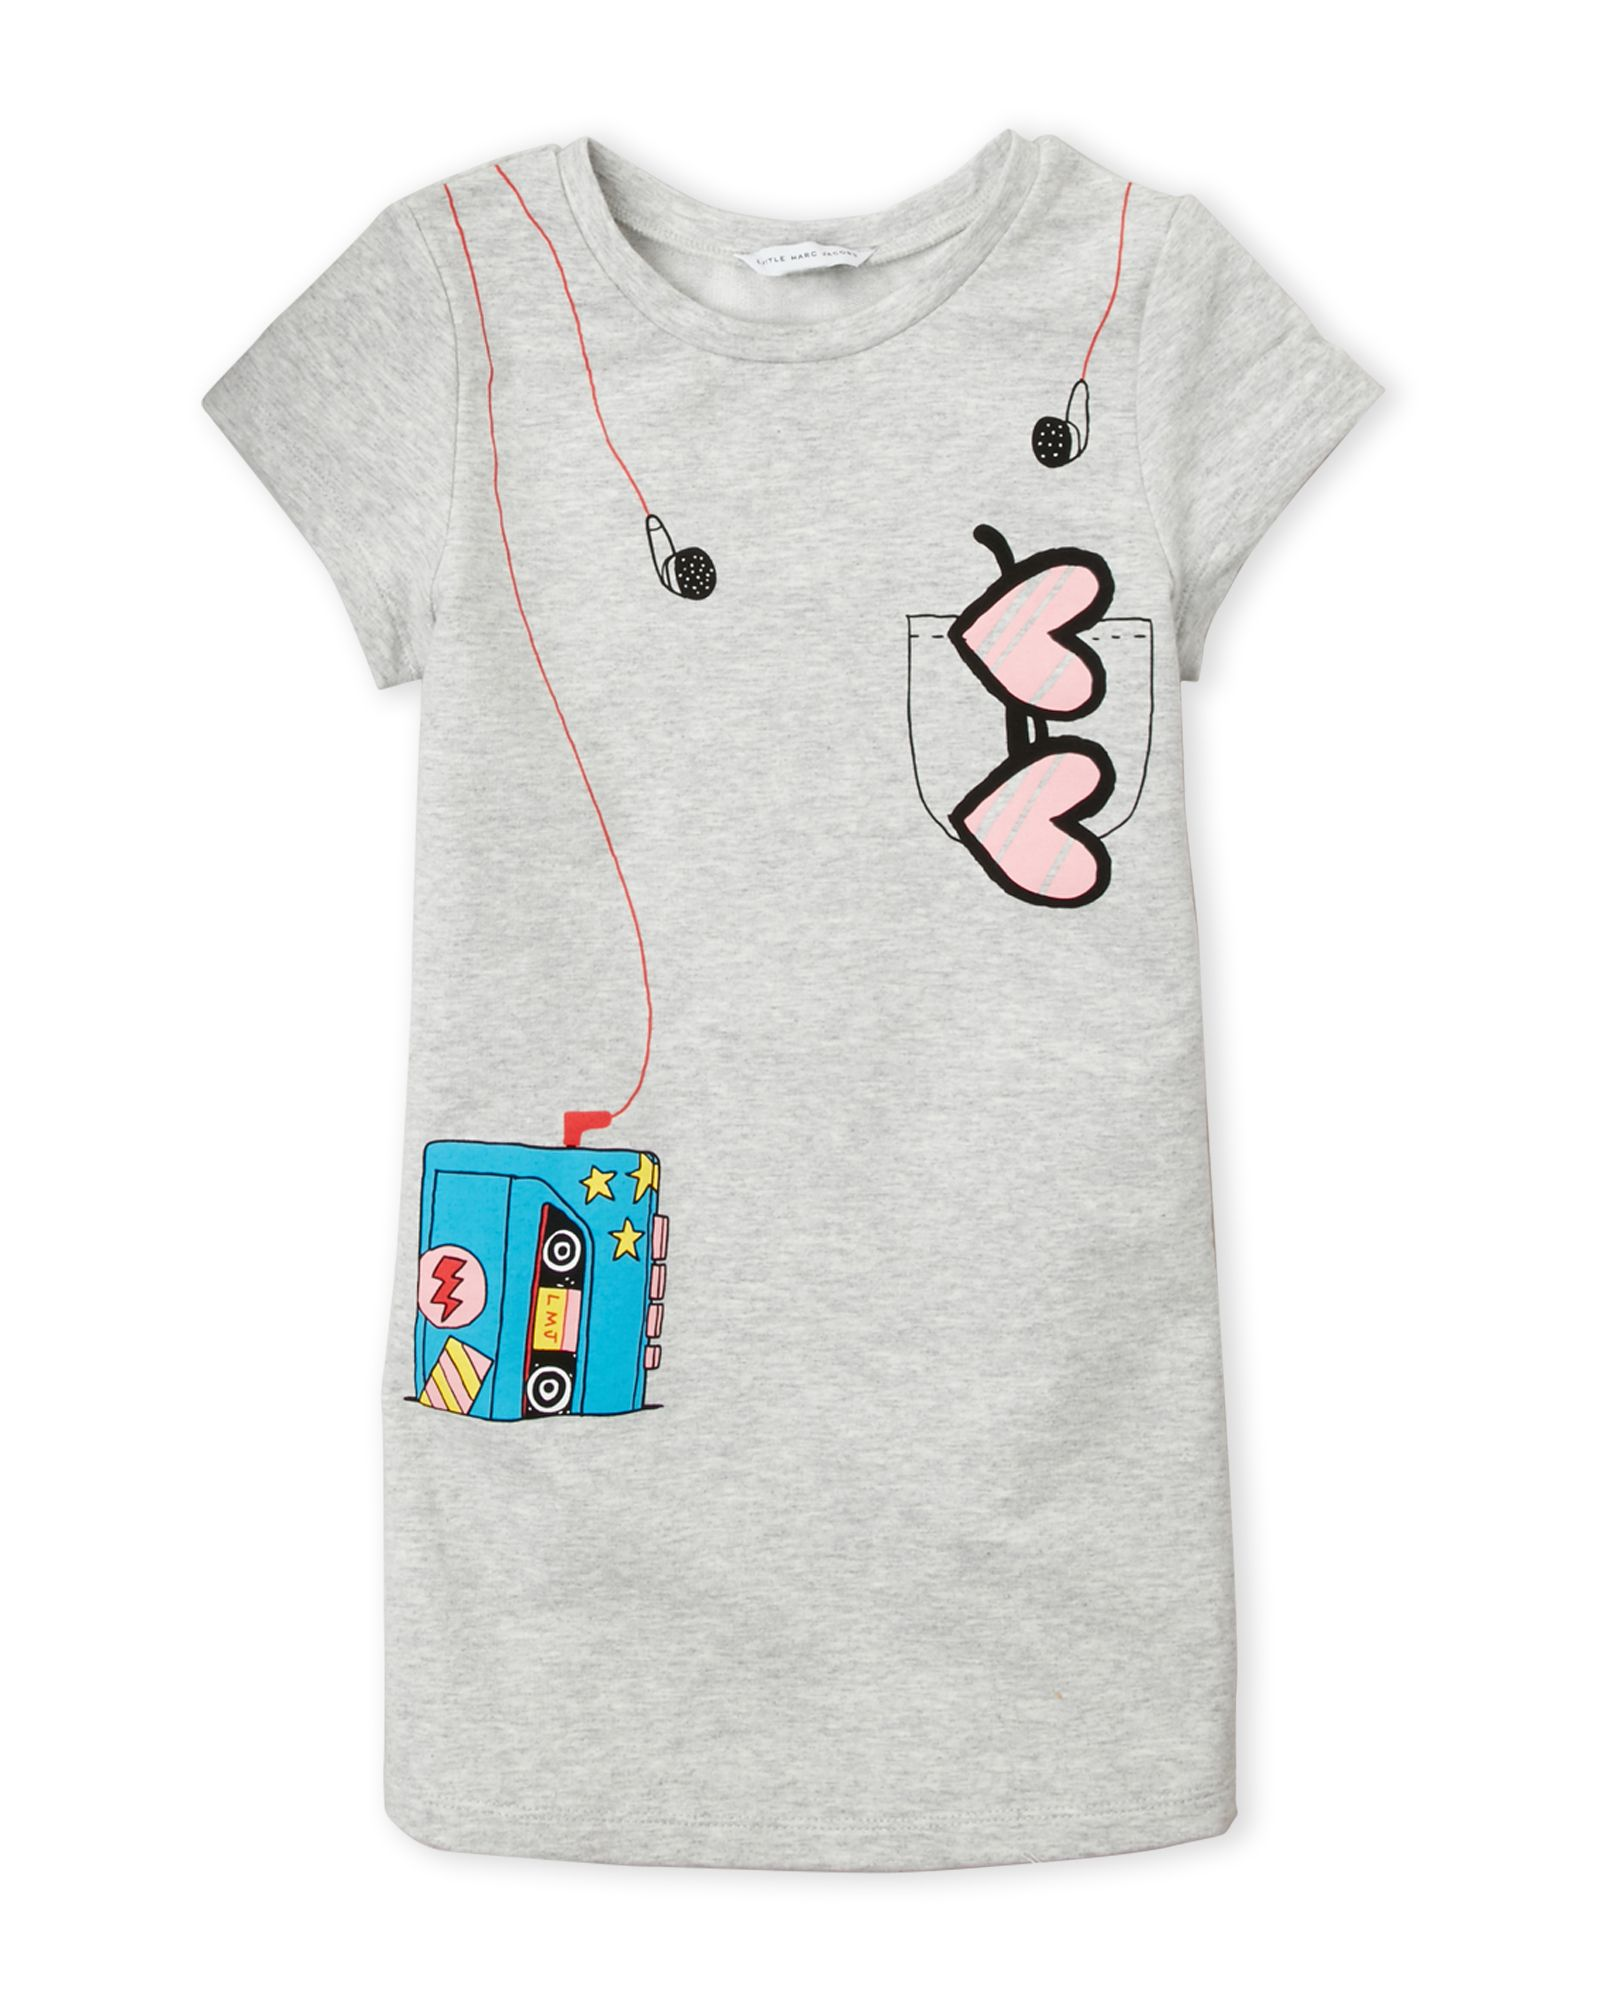 85dcfd7e2bc7 Girls 4-6x) Grey Headphones T-Shirt Dress in 2019 | *Apparel ...